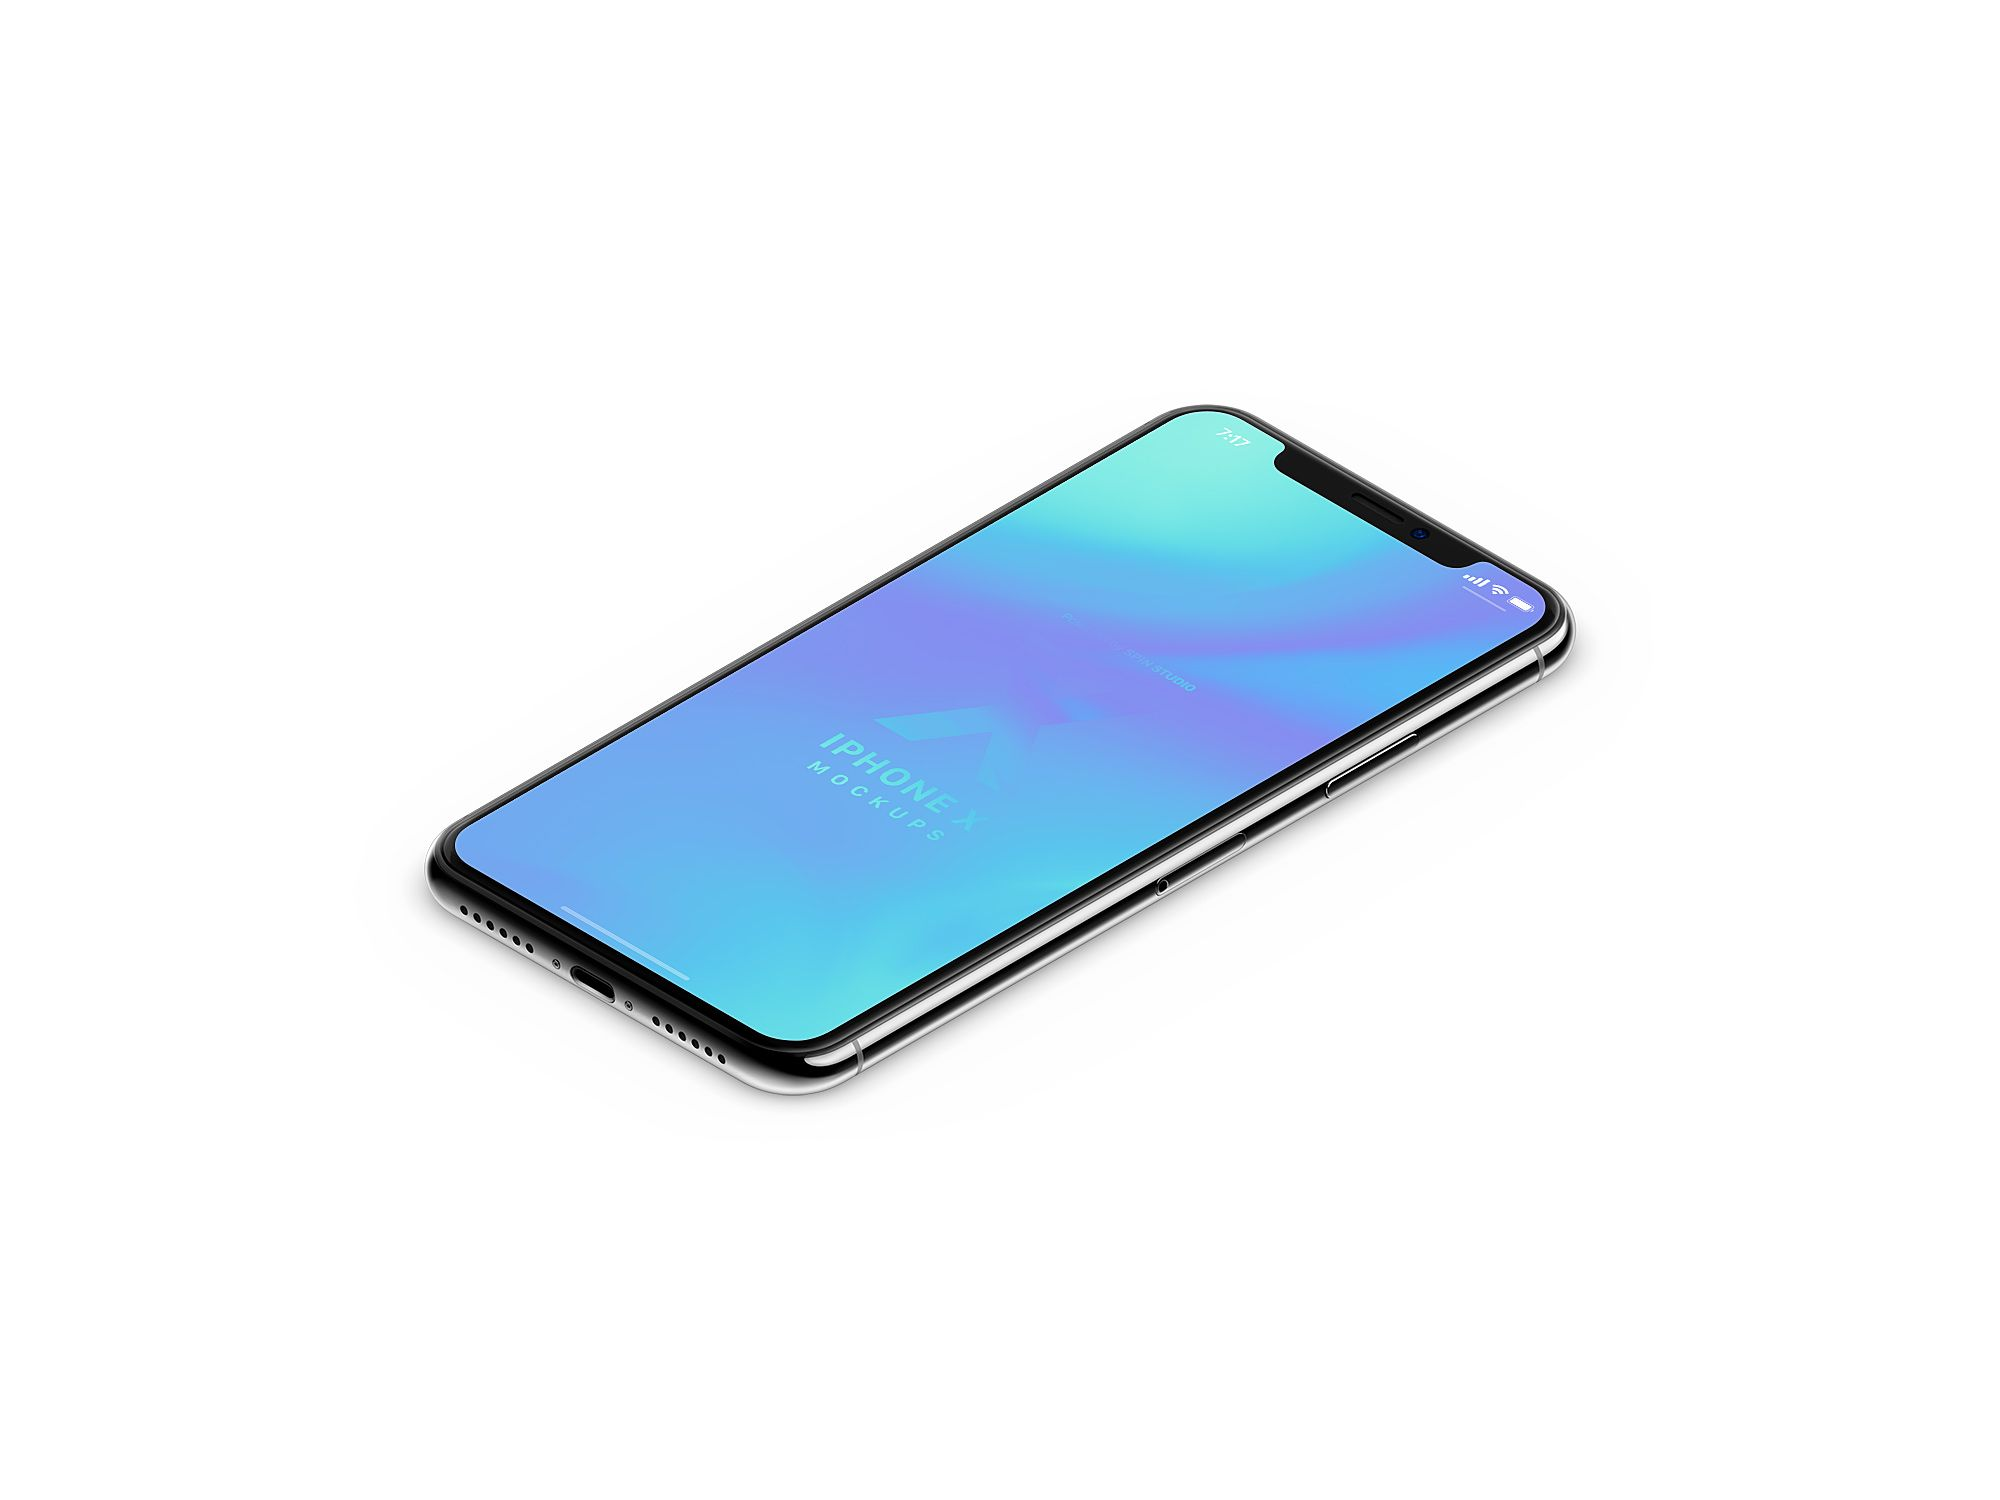 iPhone X Isometric Mockup Free + Clay Iphone, Mockup